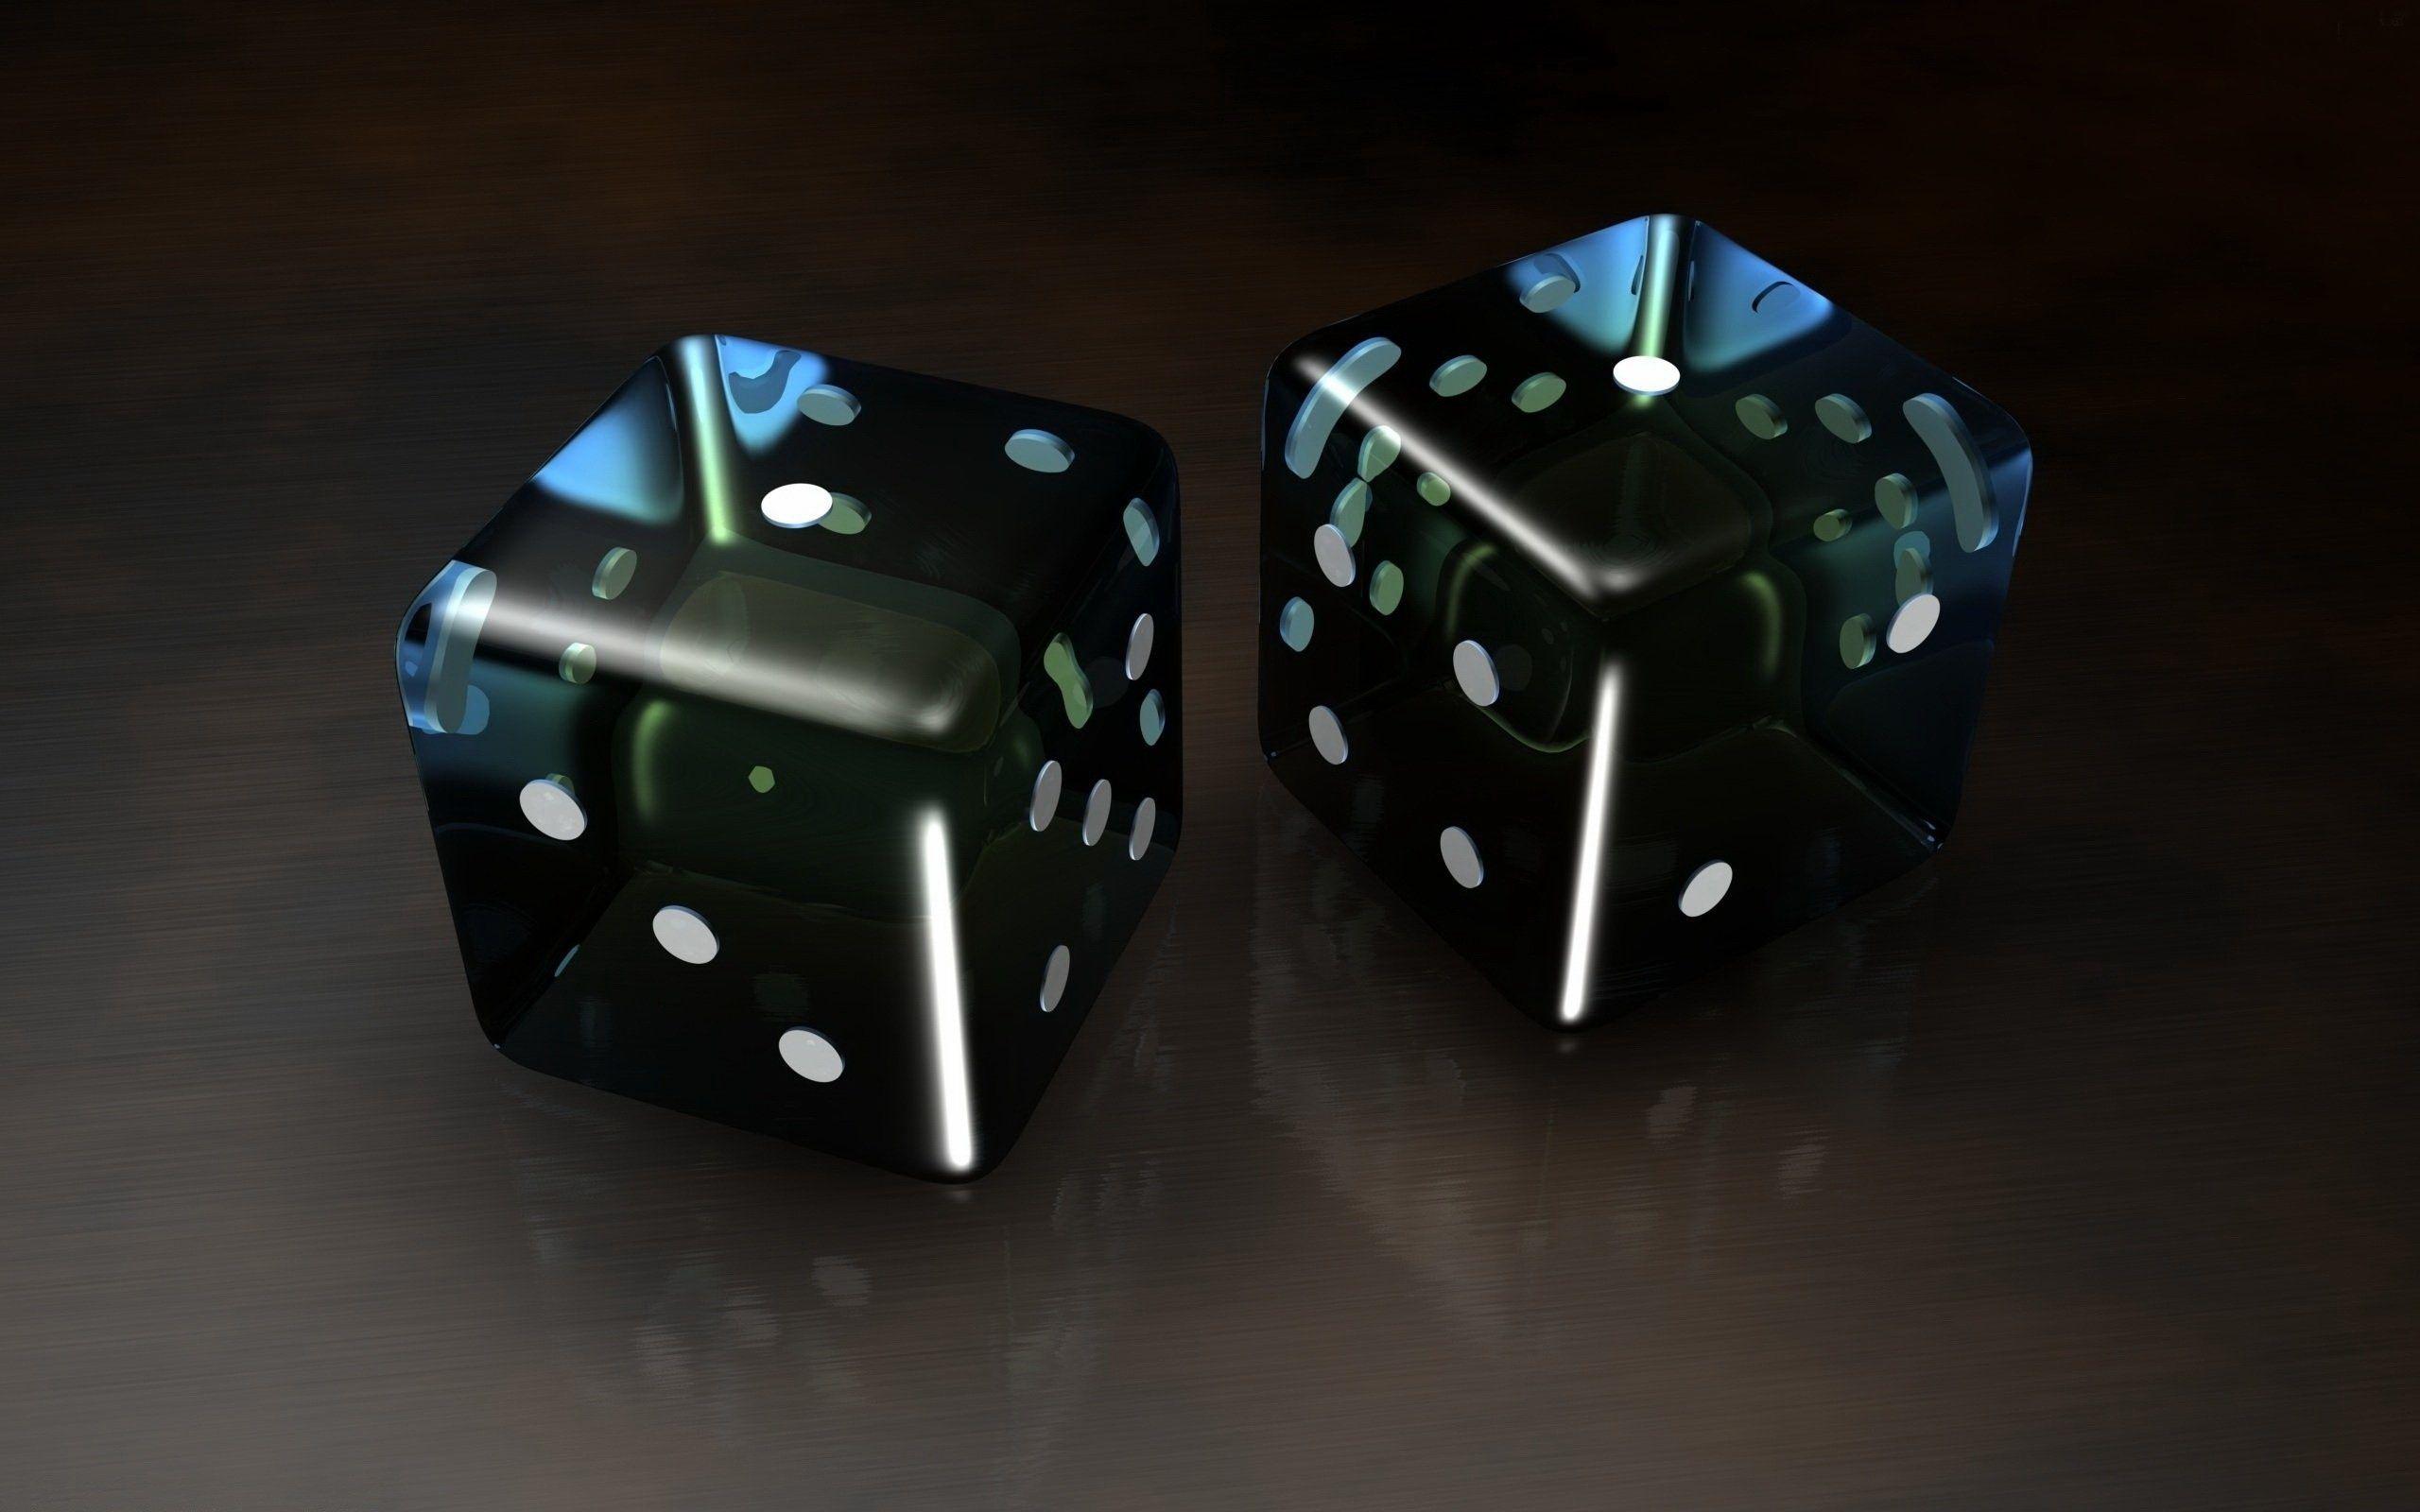 dice wallpaper hd 1080p